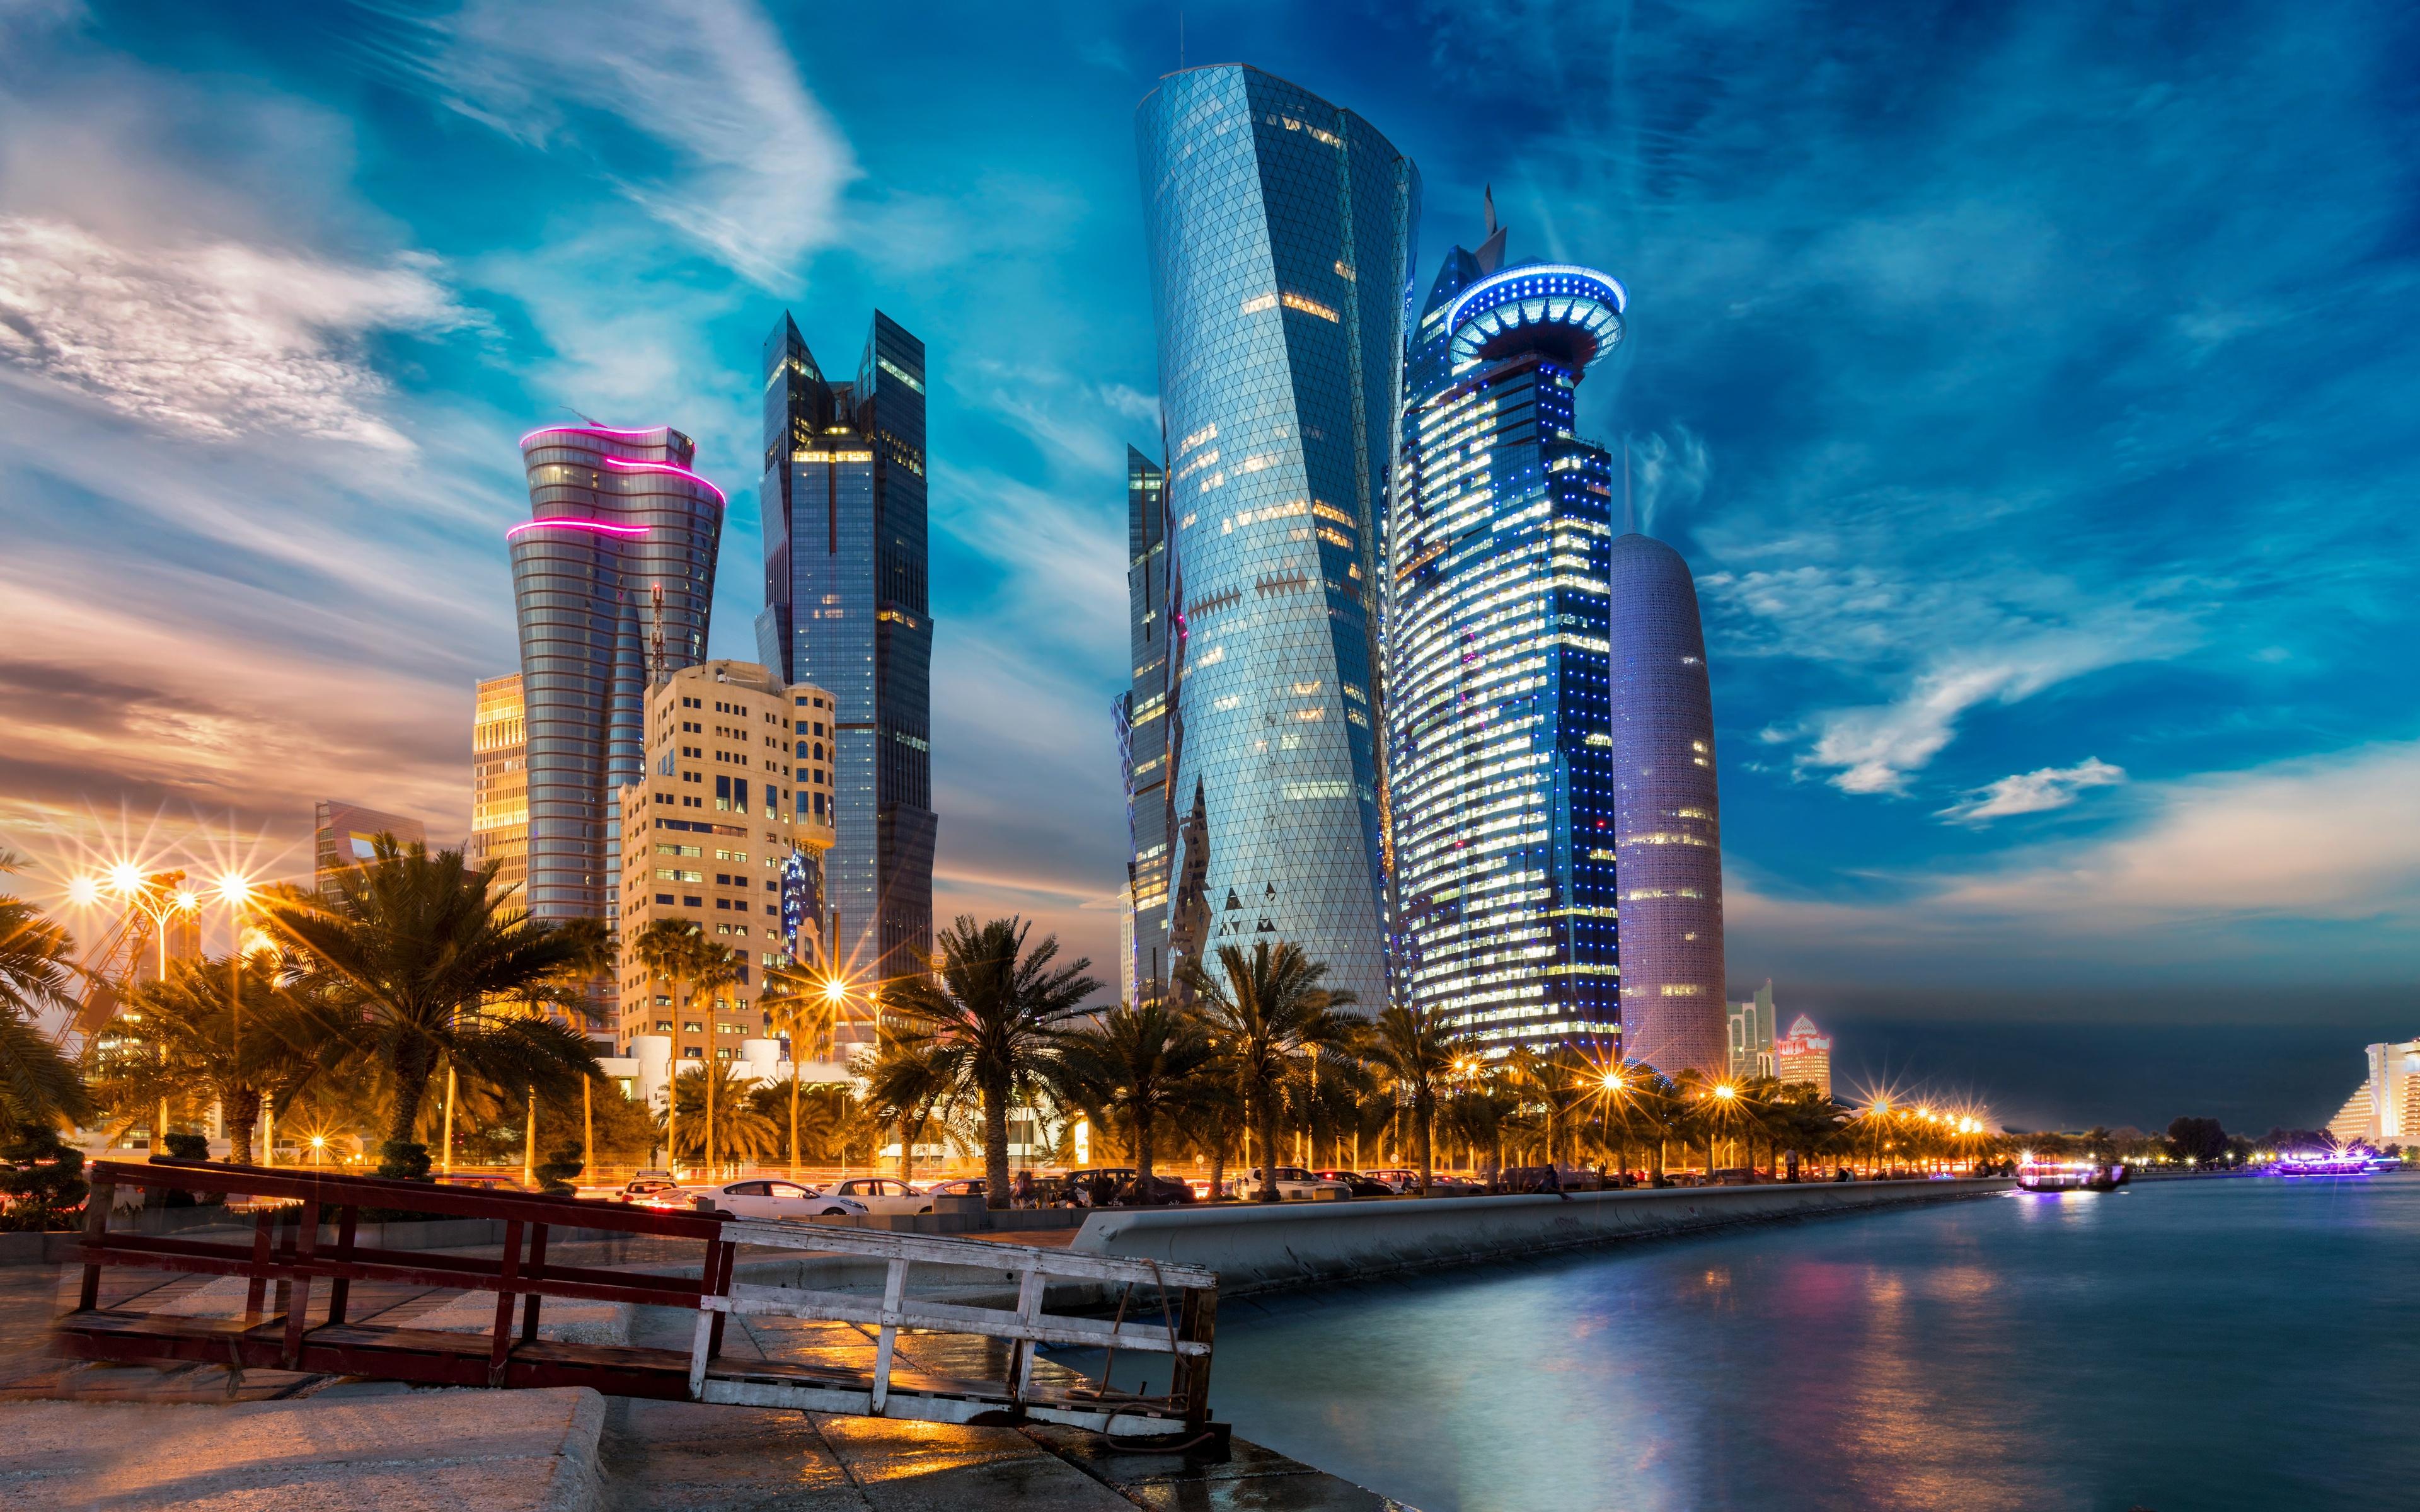 evening-houses-skyscrapers-qatar-5k-g2.jpg